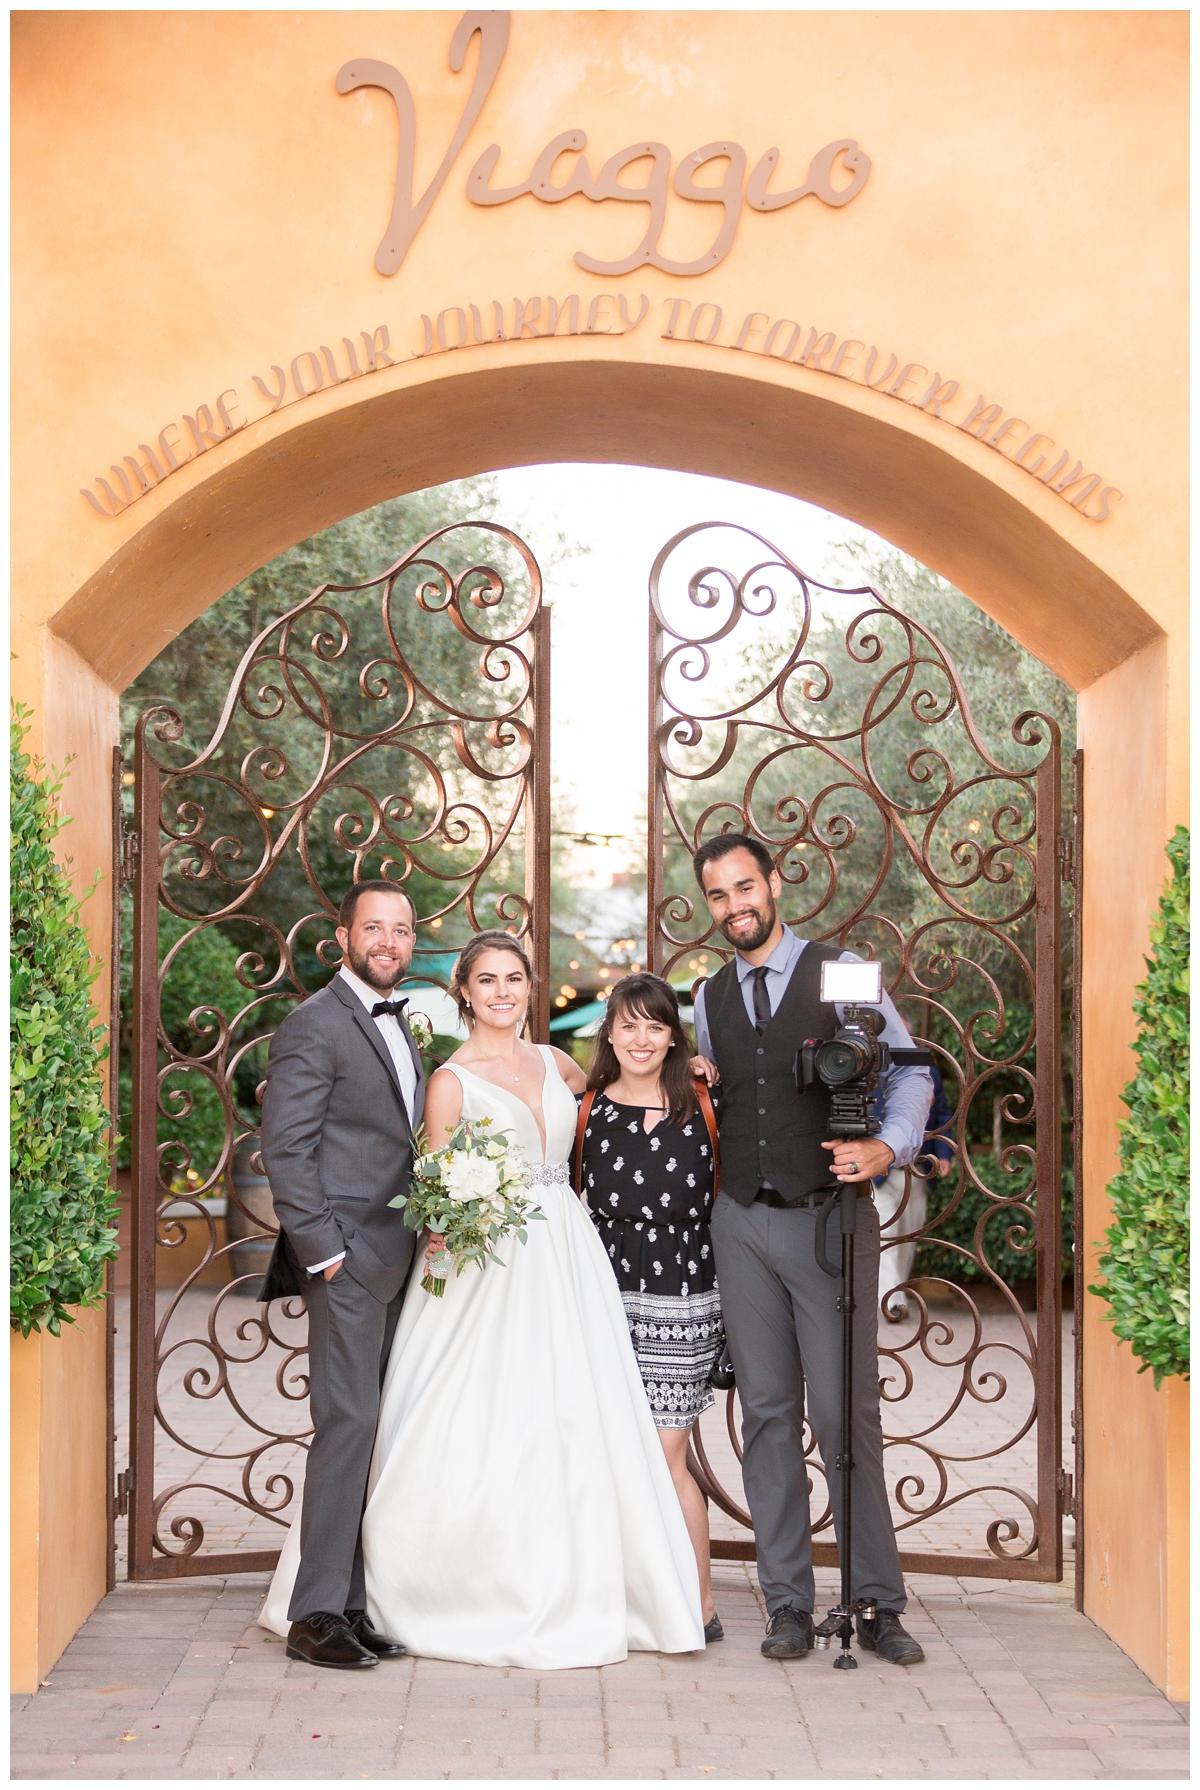 Viaggio-Winery-Wedding-Photos_5220.jpg